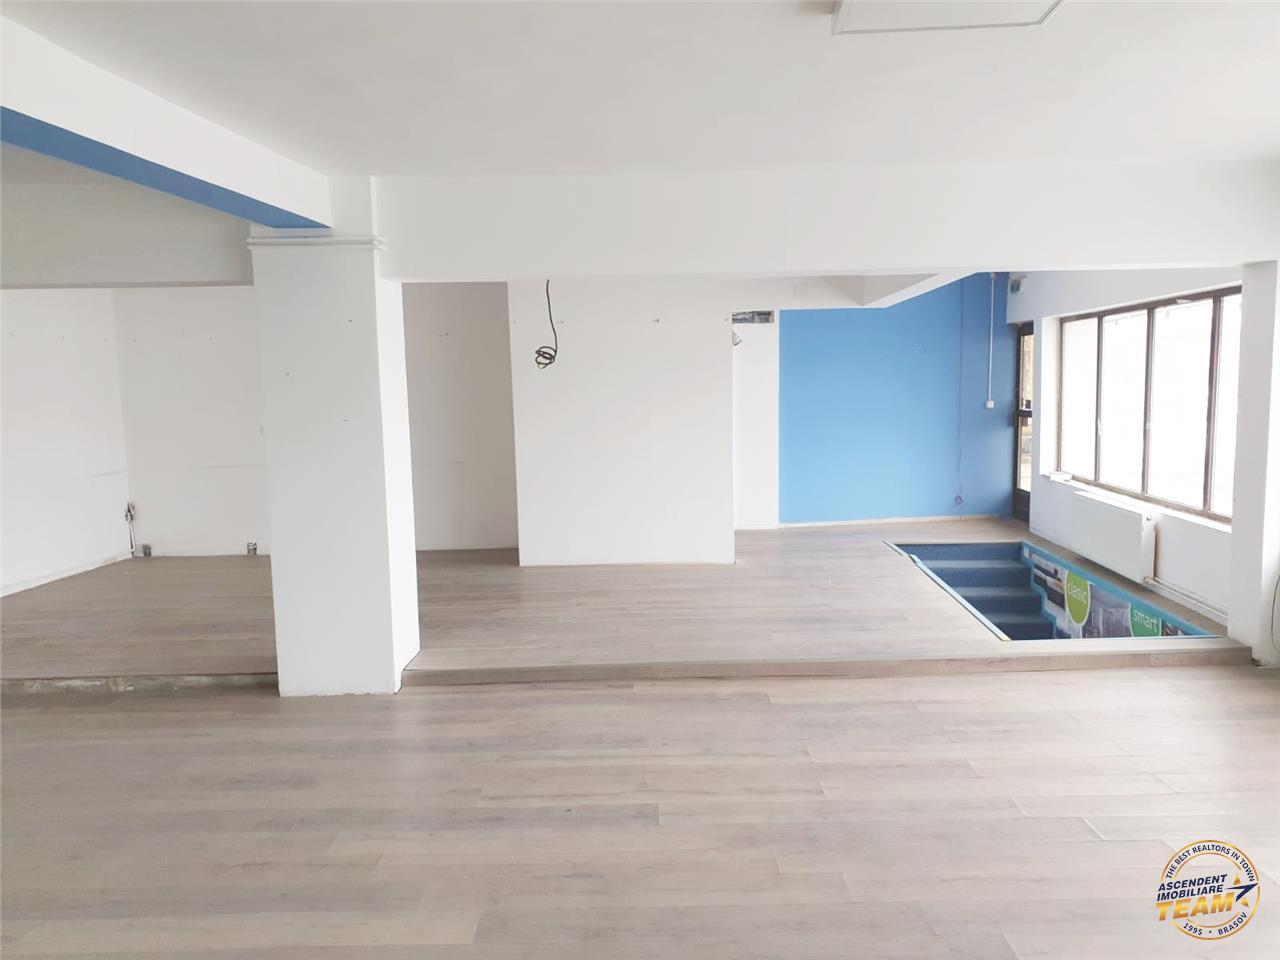 OFERTA TRANZACTIONATA!! Oportunitate! Spatiu vitrinat, pe doua nivele, ariat pe 250 mp, in Noul Centru, Brasov